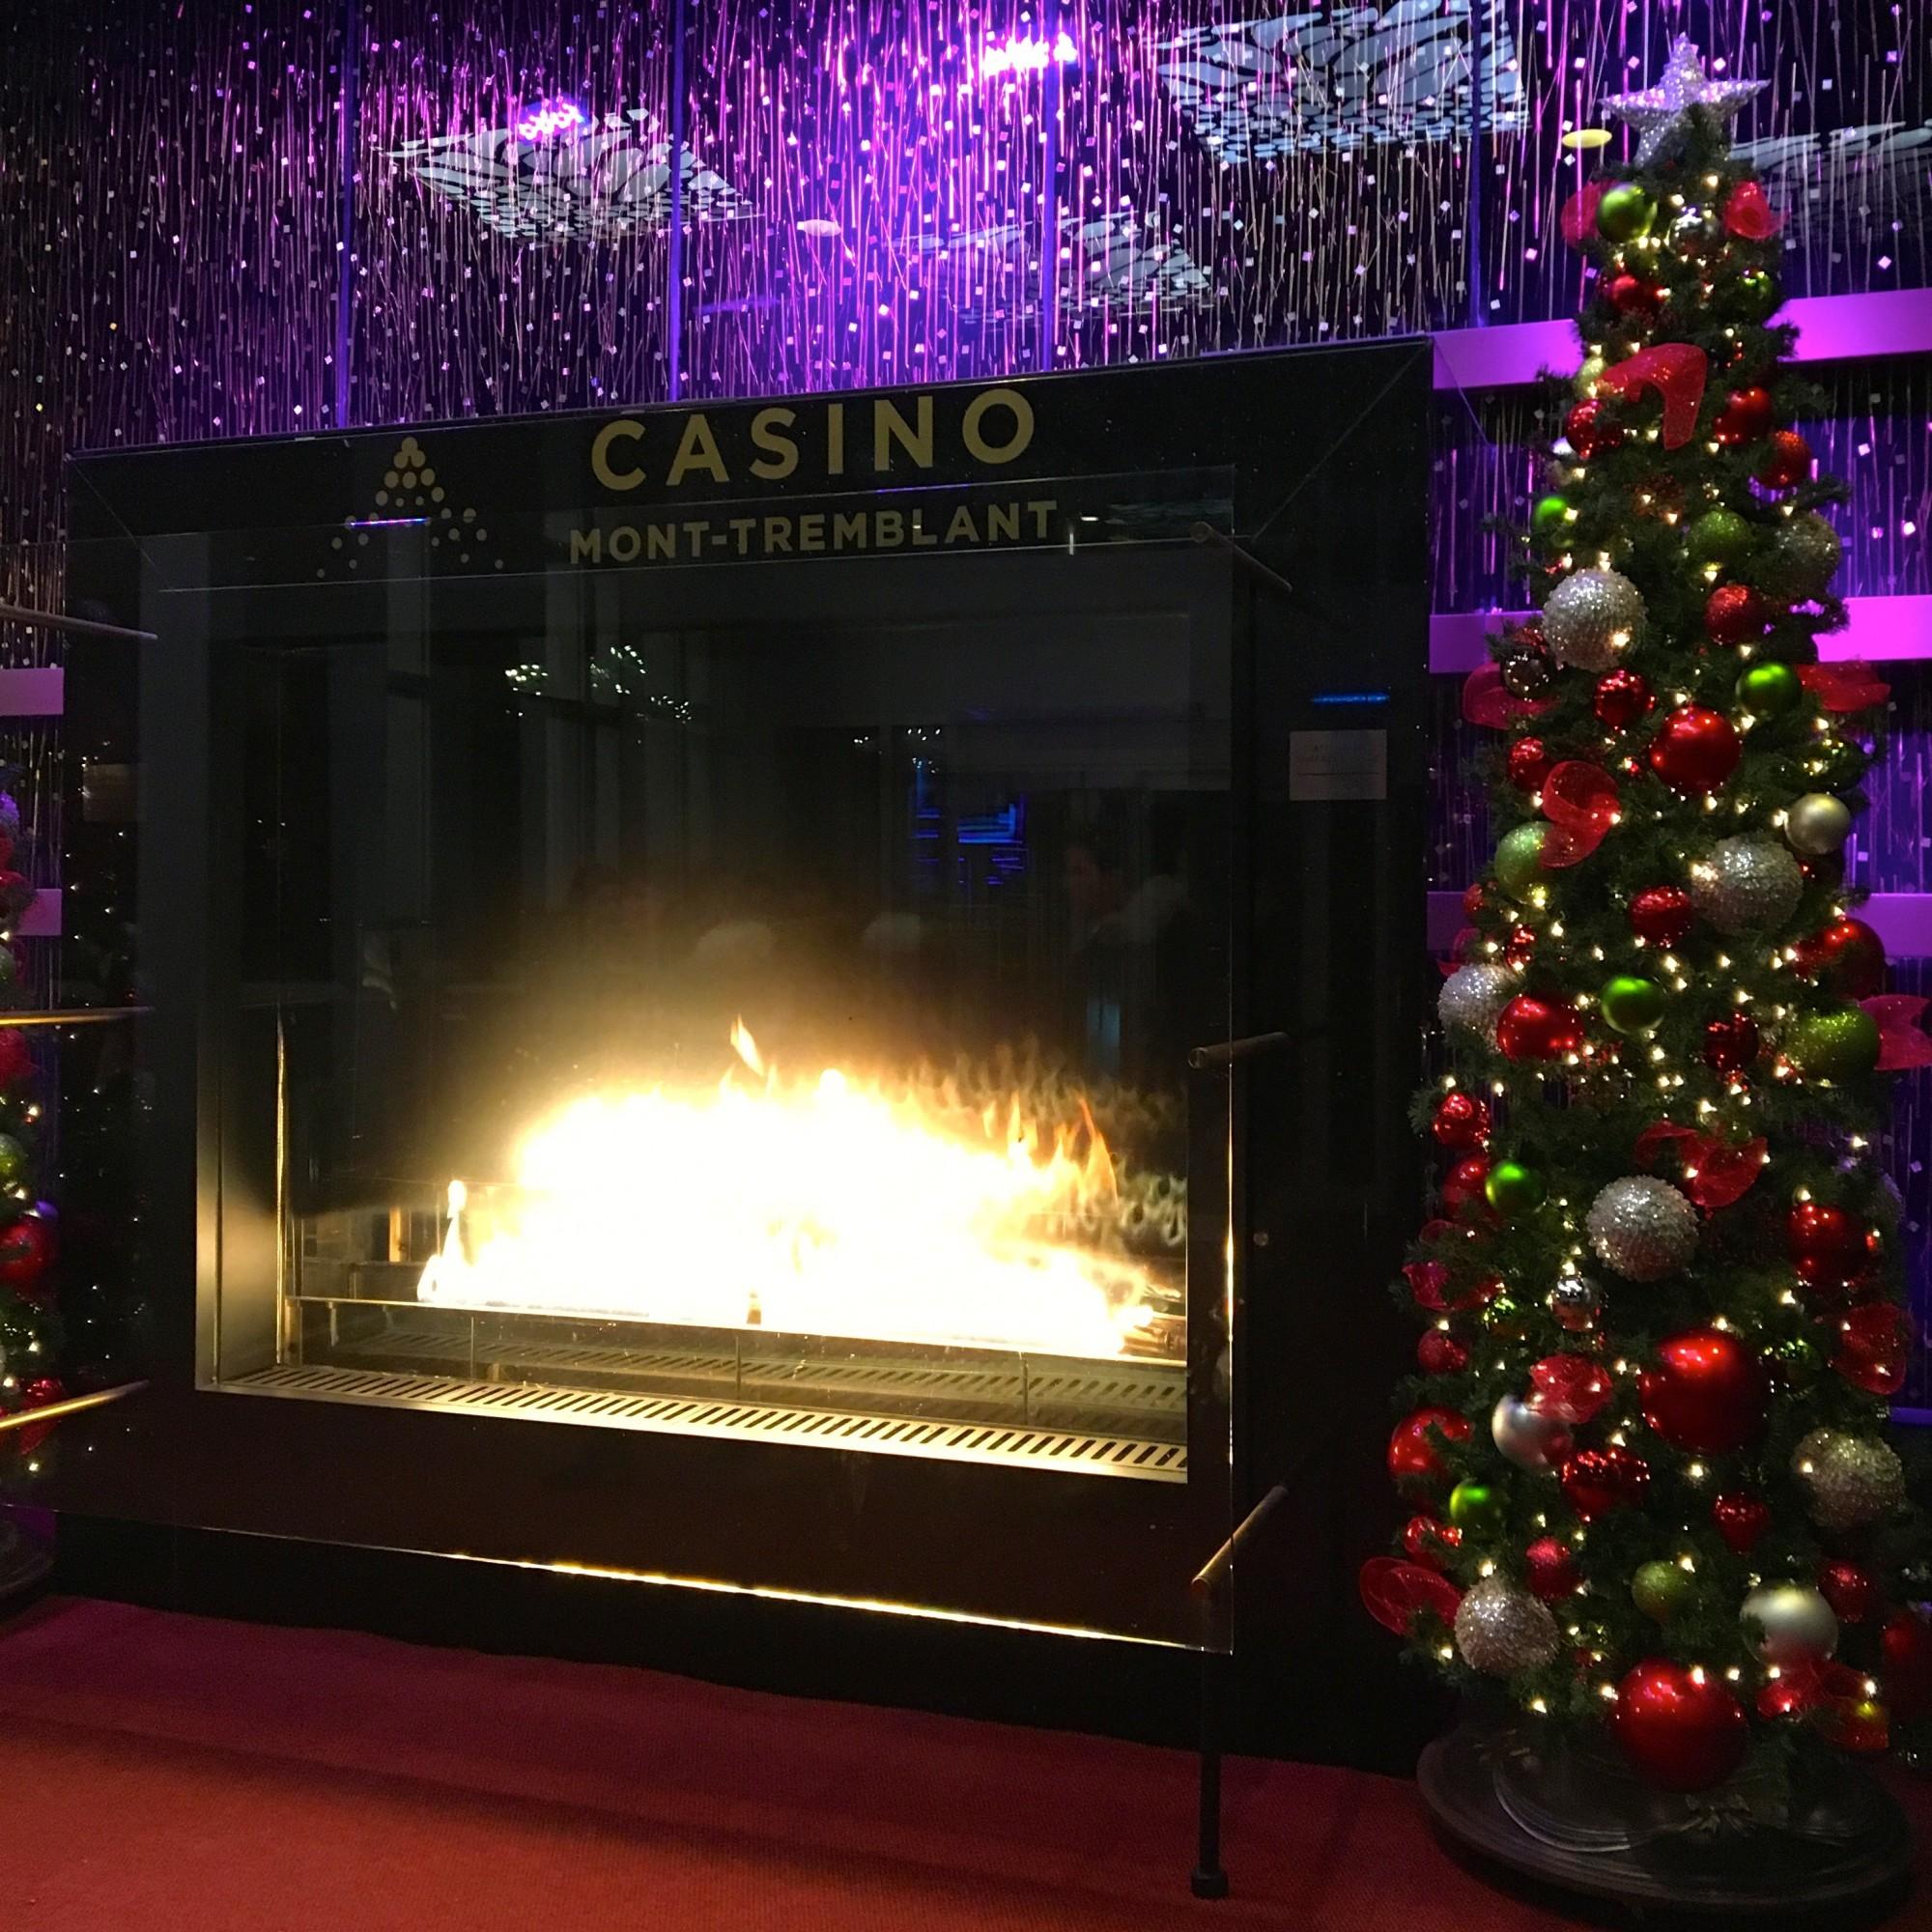 Casino Mont-Tremblant Entrance (TH)